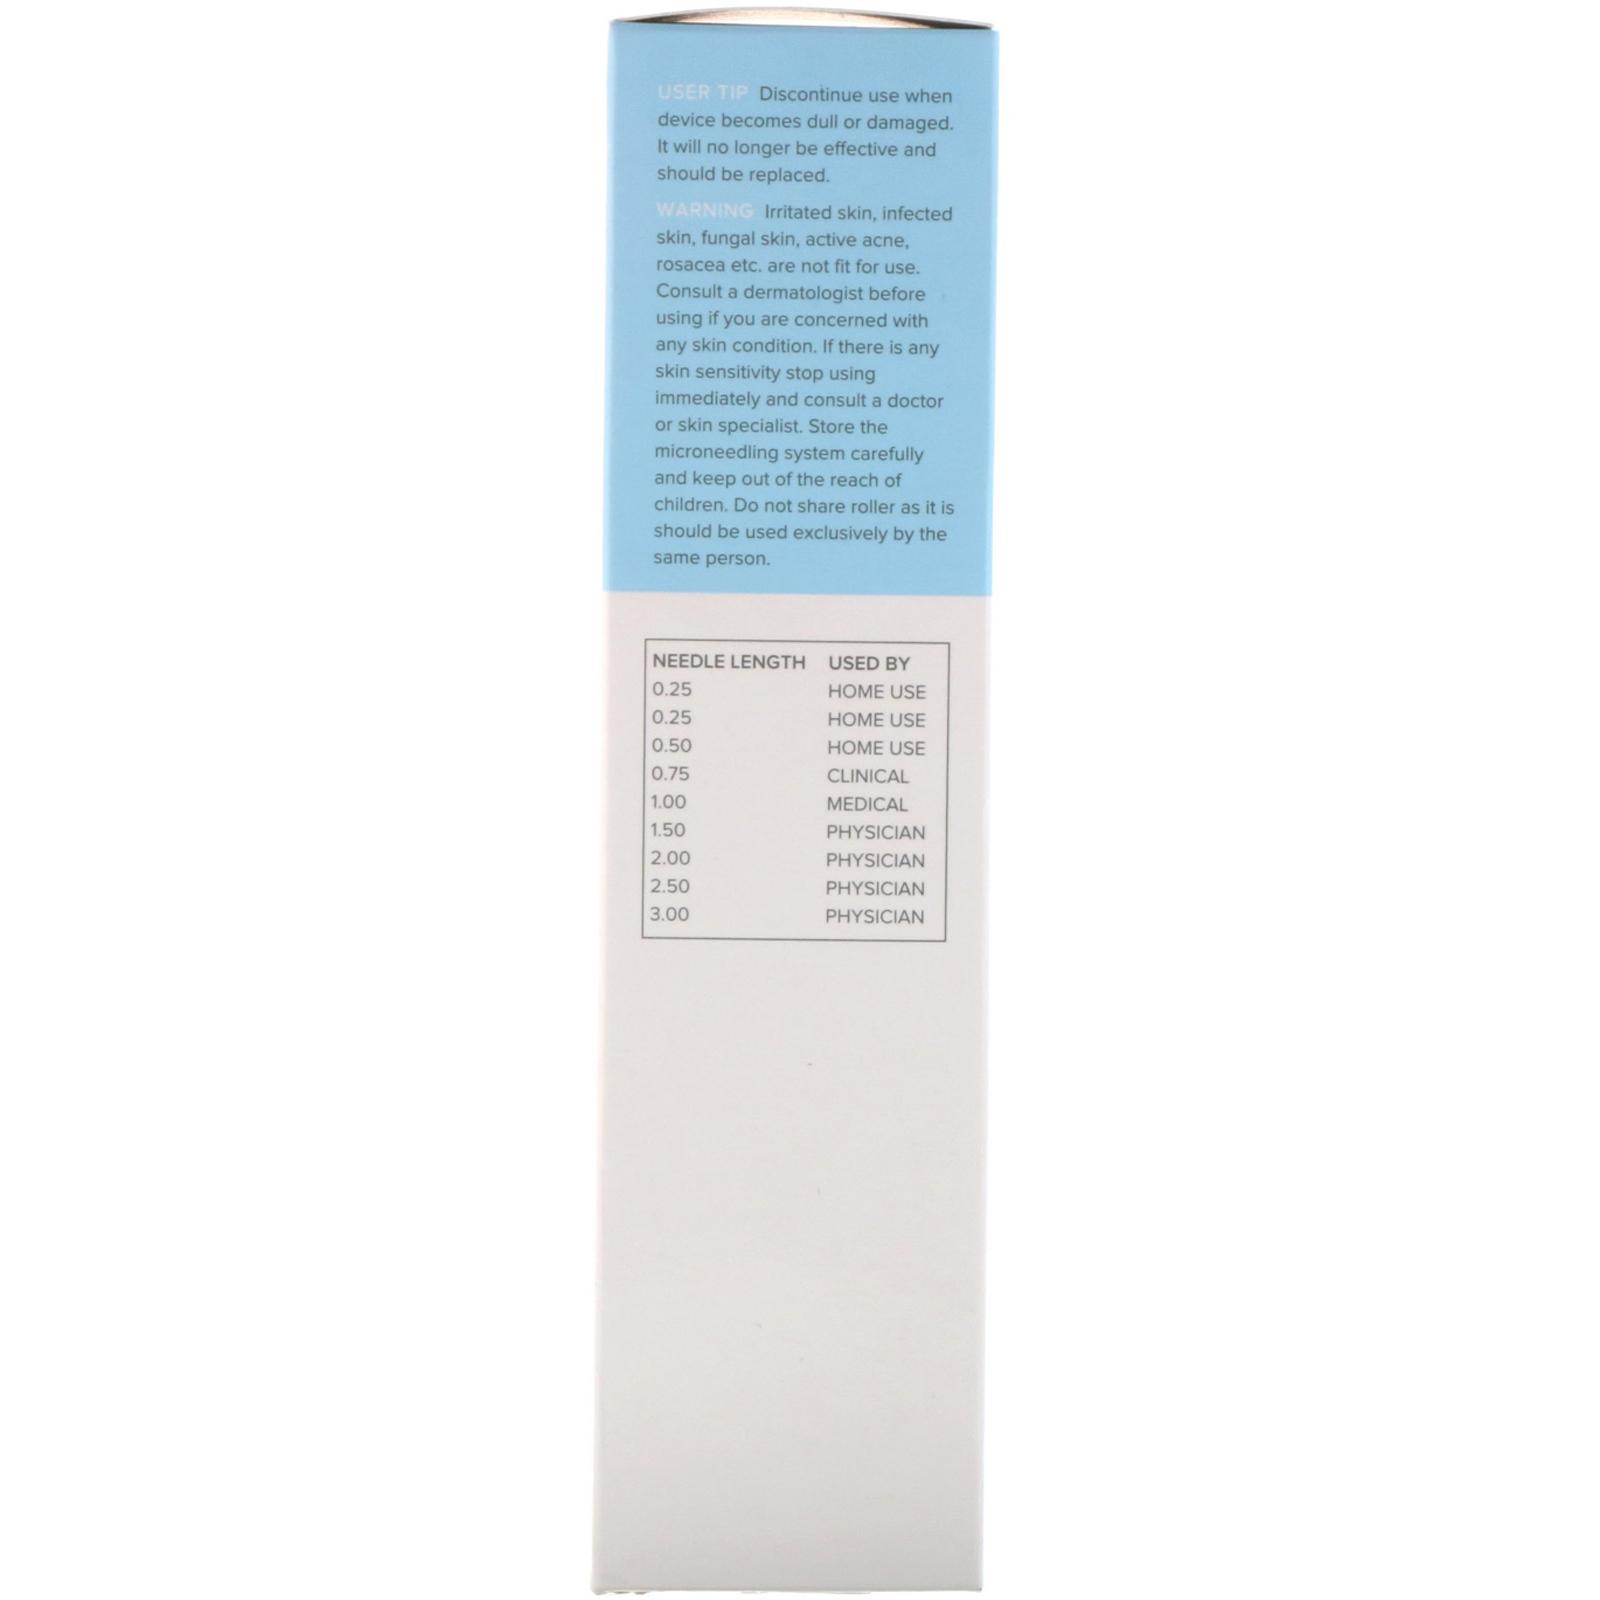 Cosmedica Skincare, Microneedling Derma Roller System - iHerb